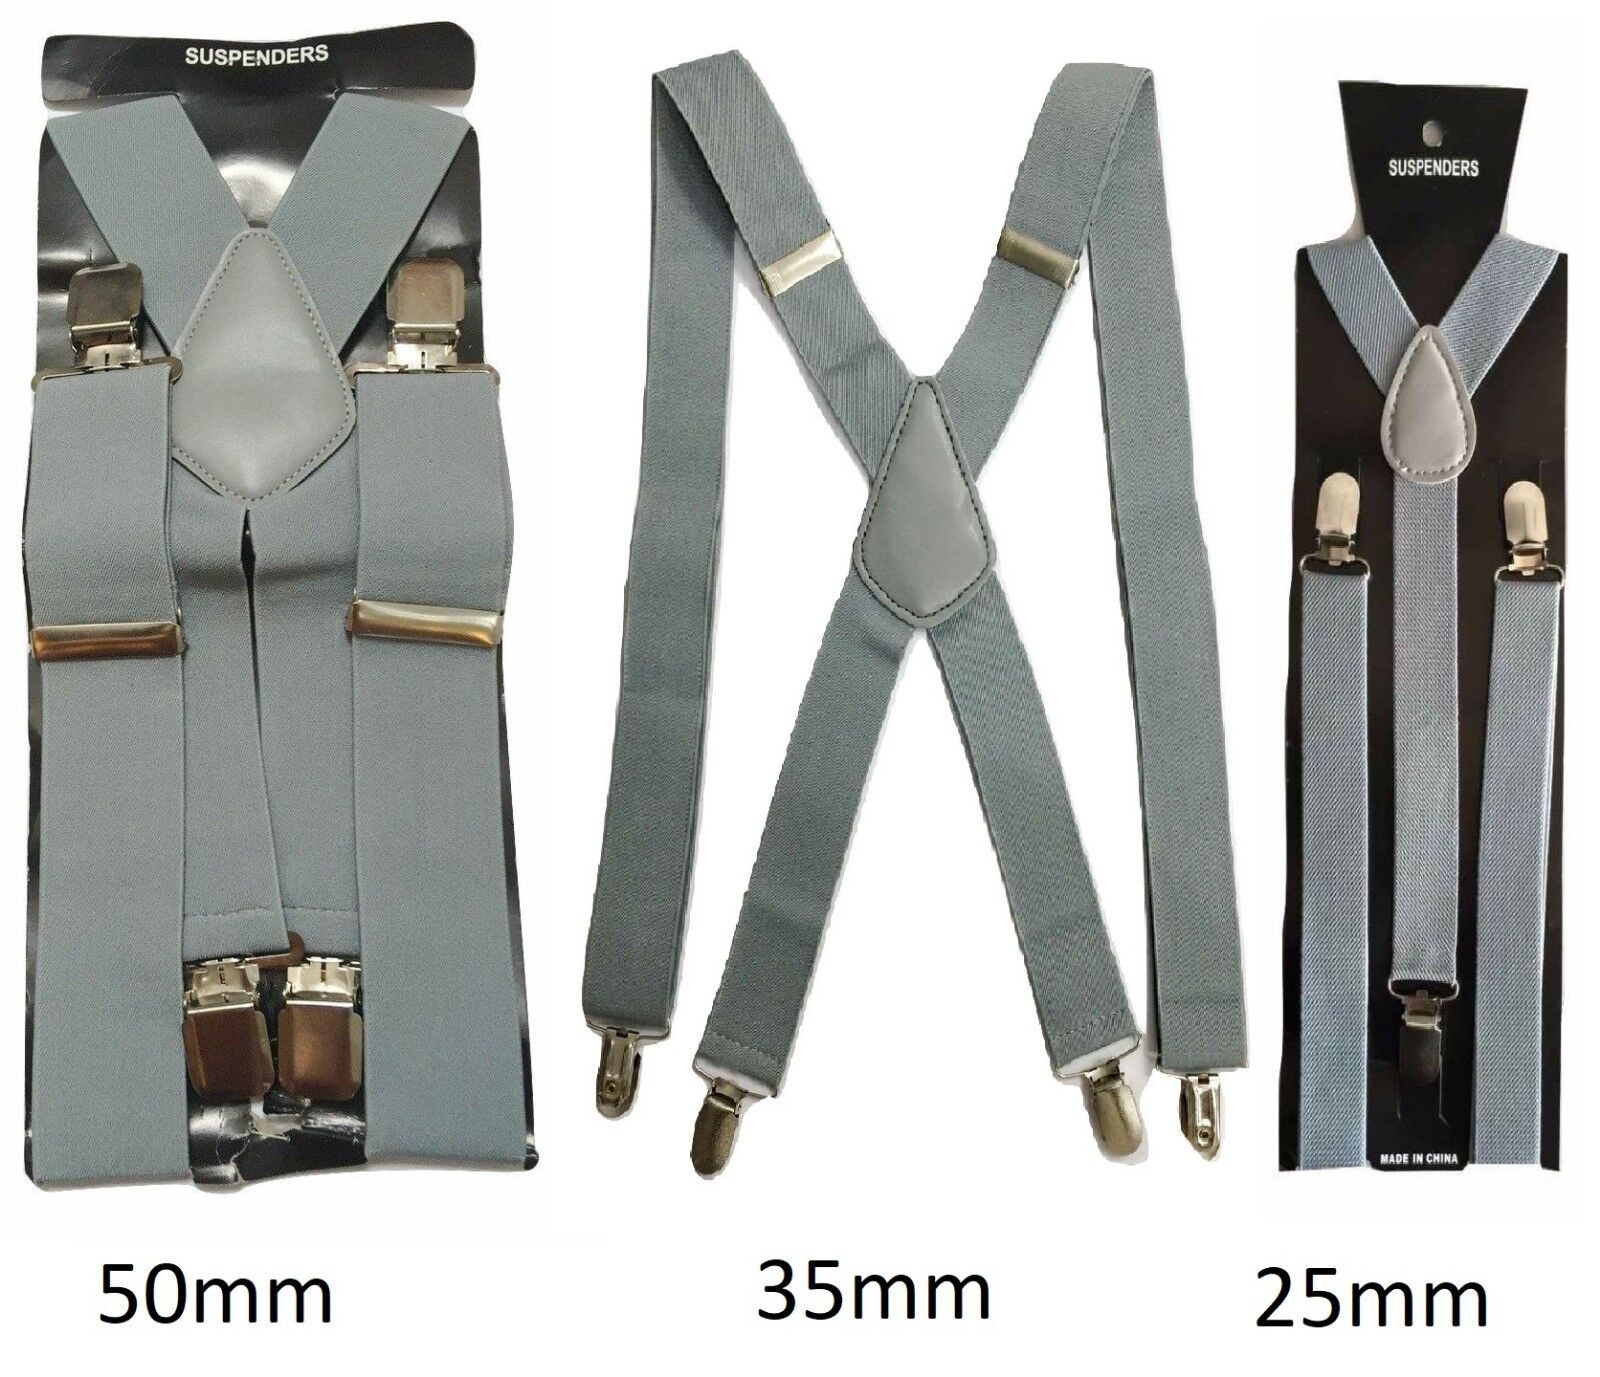 Silber Grau Herren Damen Hosenträger Elastisch Breit Haltbar Hose 25mm 35mm 50mm